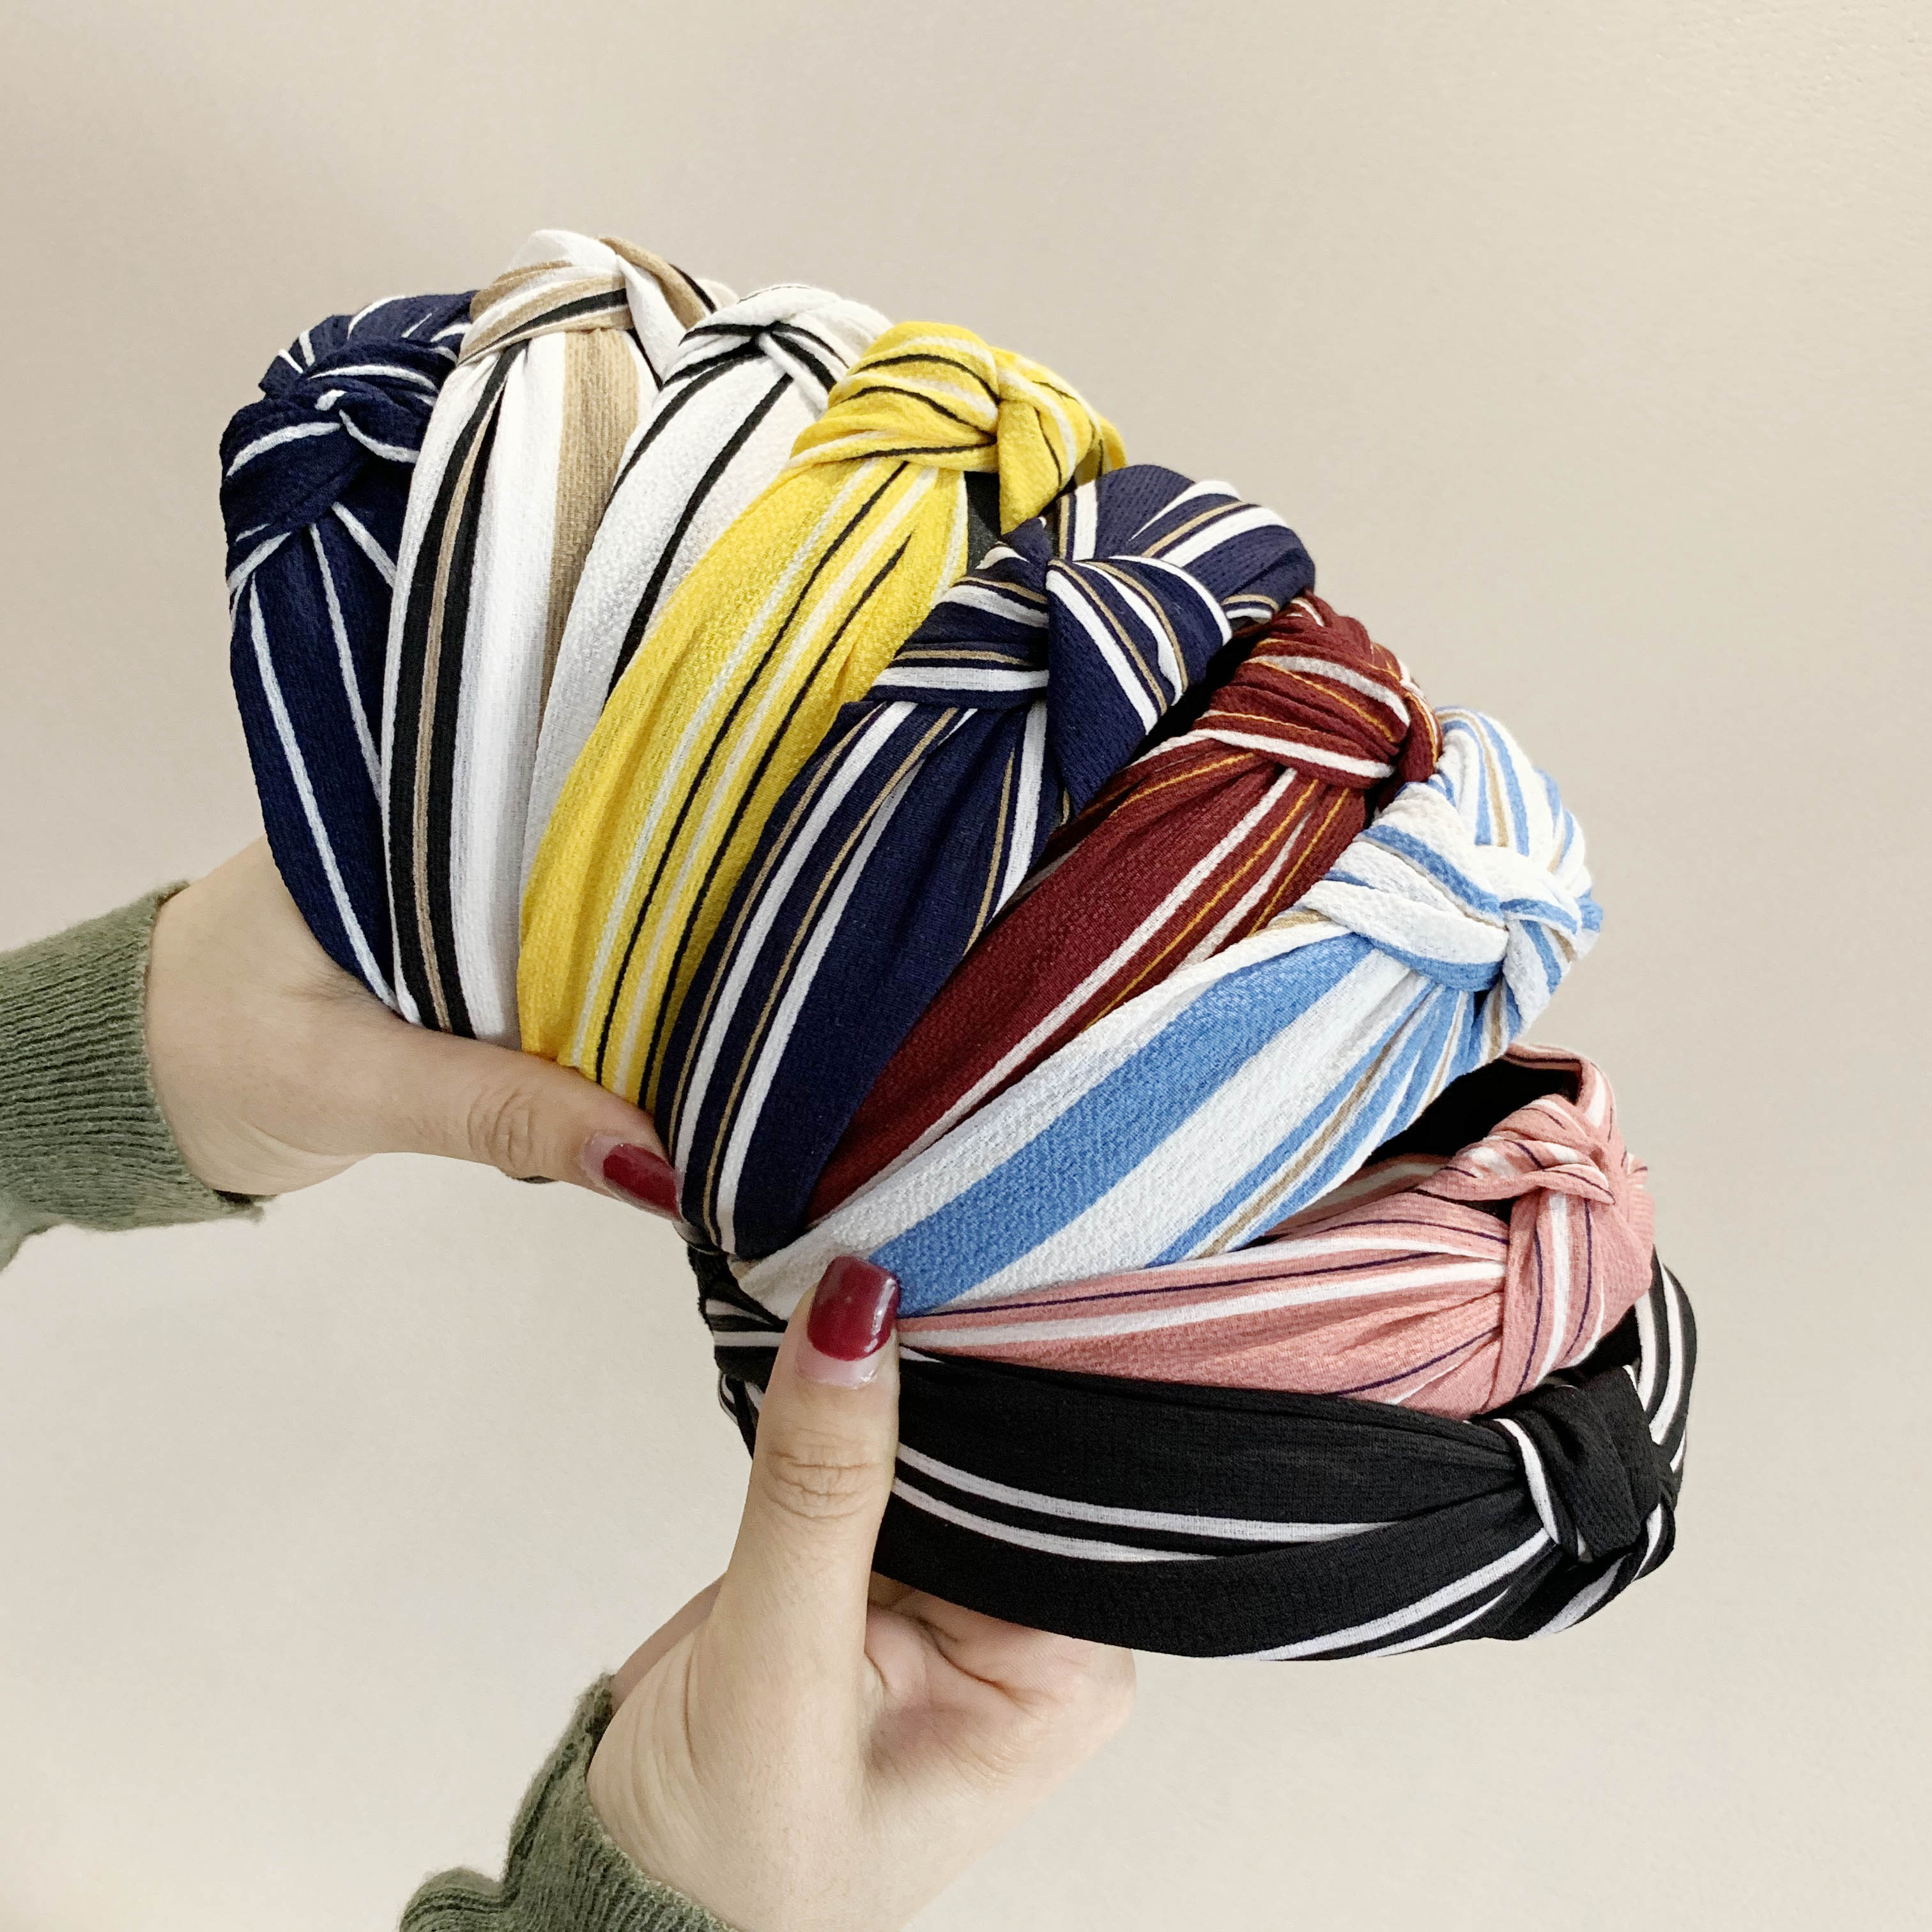 Chen Yan New Stripe Headband Fashion Chiffon Headbands Knot Cross Hairband XLFG7